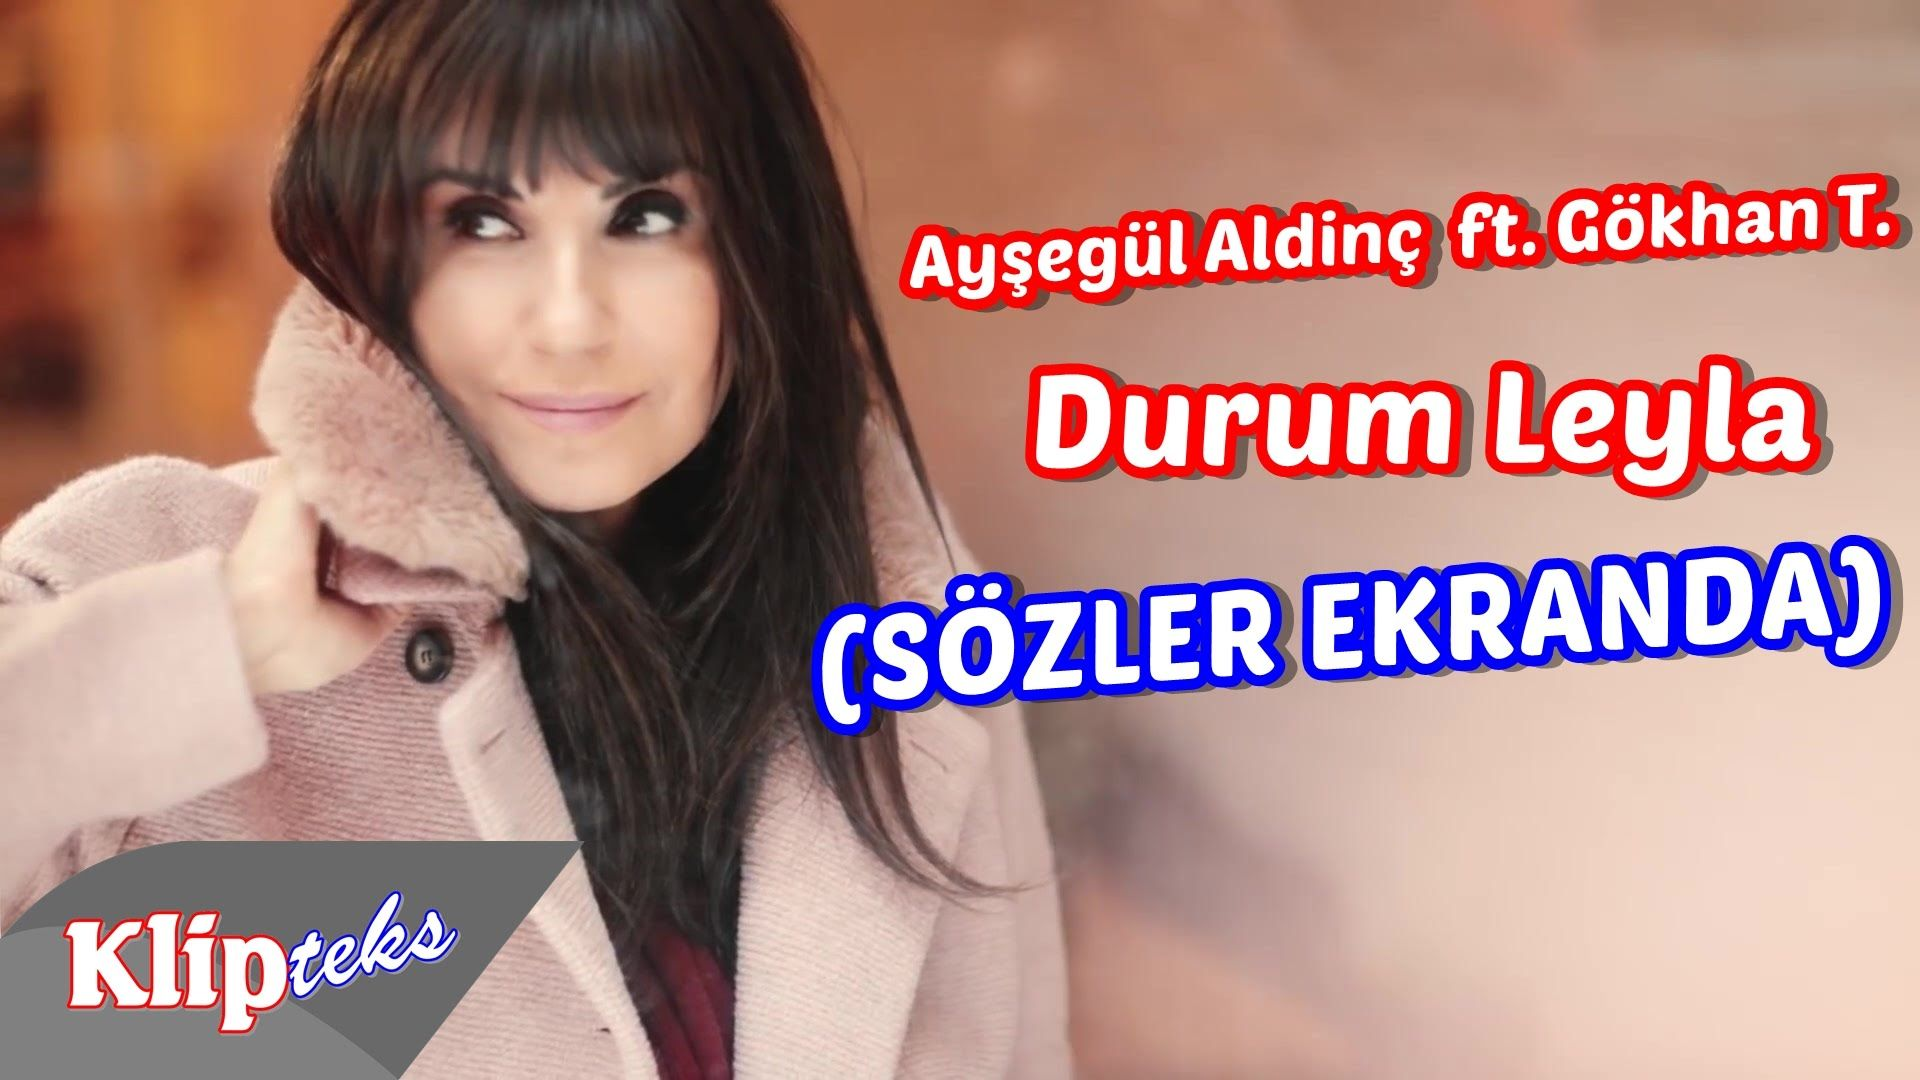 Aysegul Aldinc Ft Gokhan Turkmen Durum Leyla Videolar